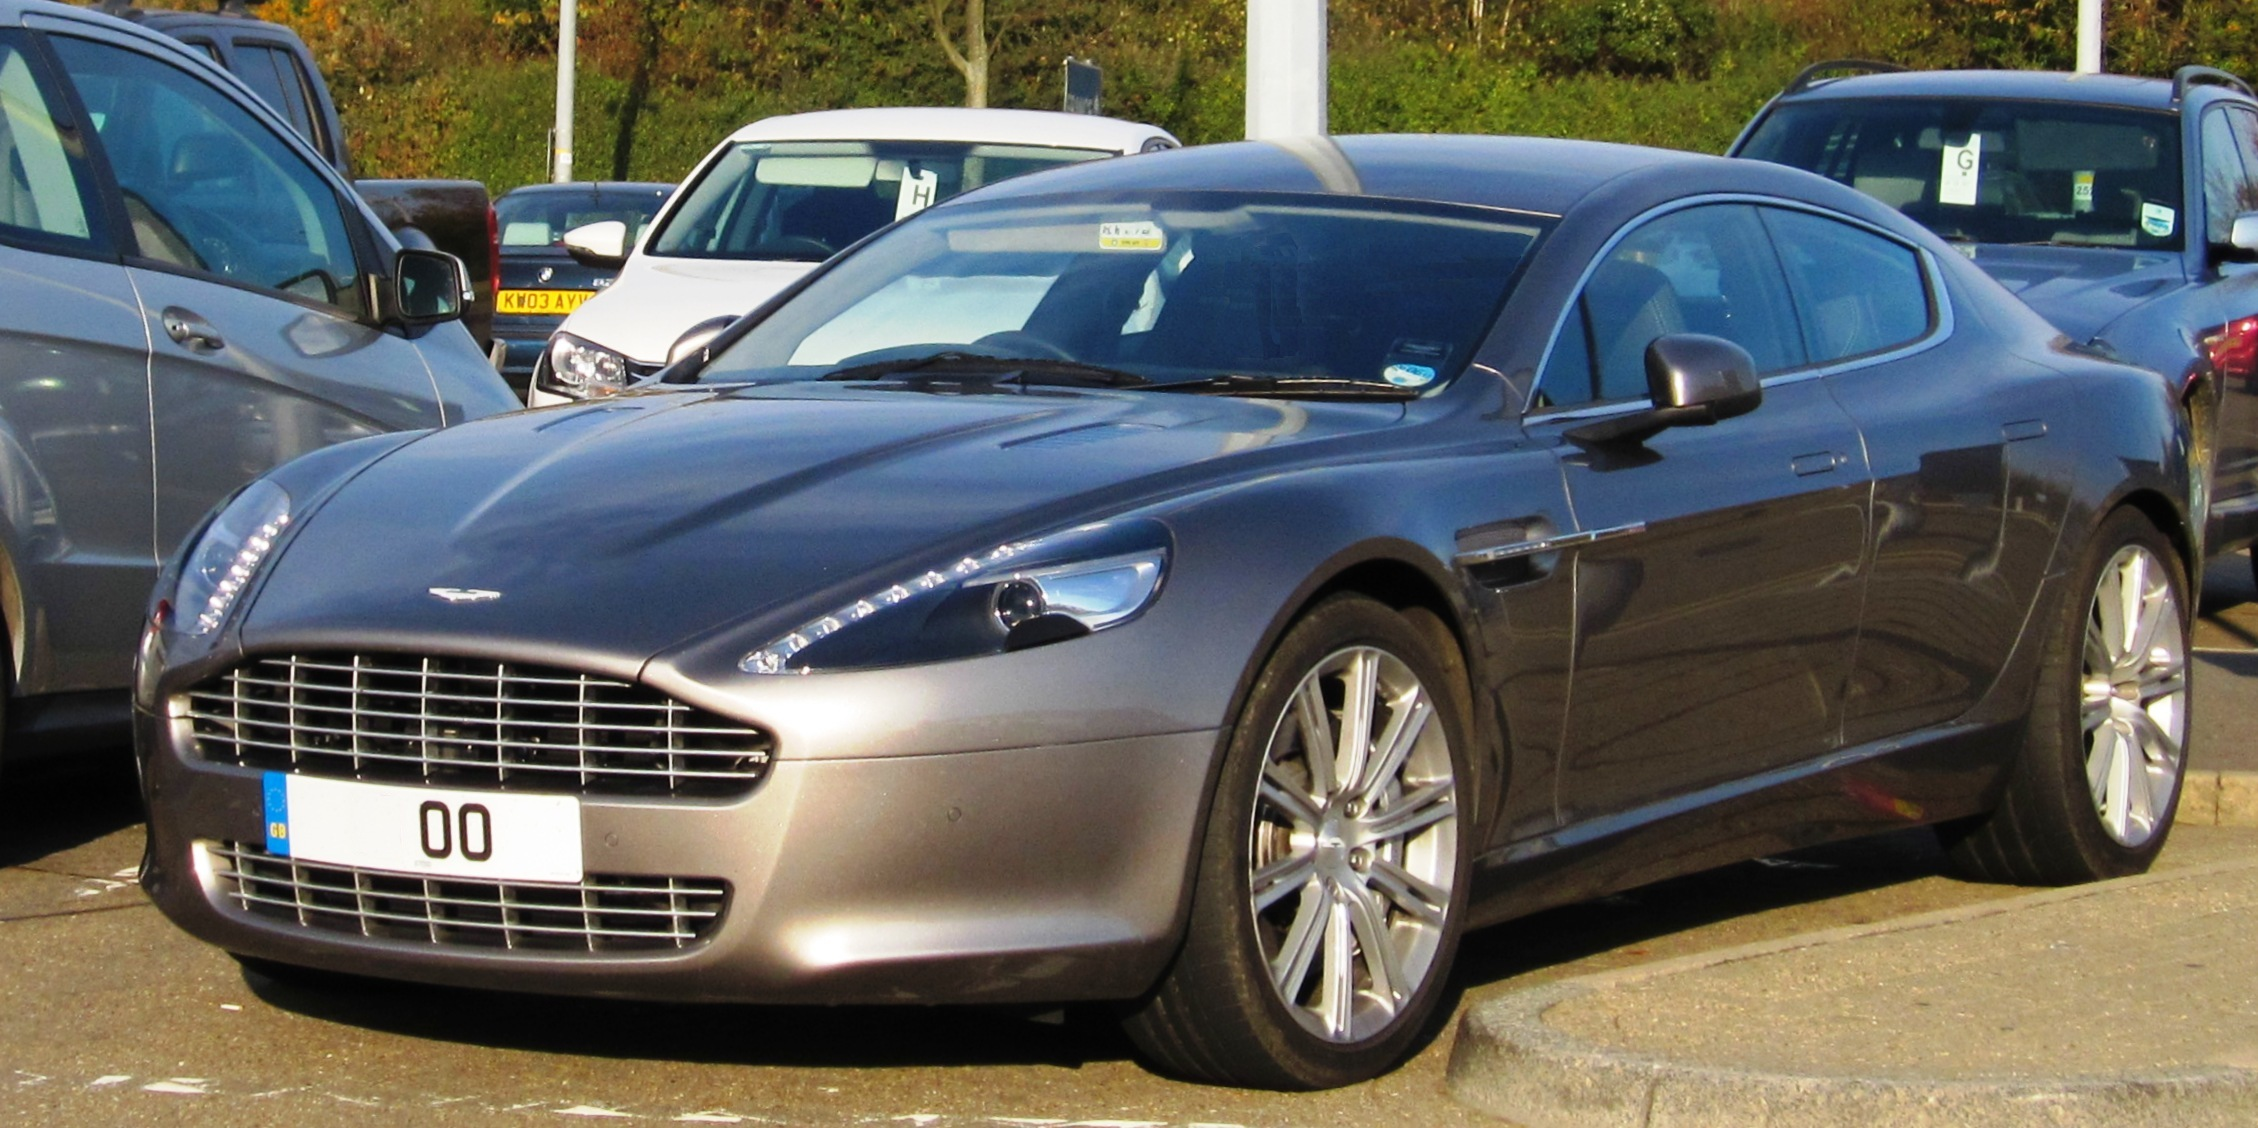 Aston 2011 martin rapide